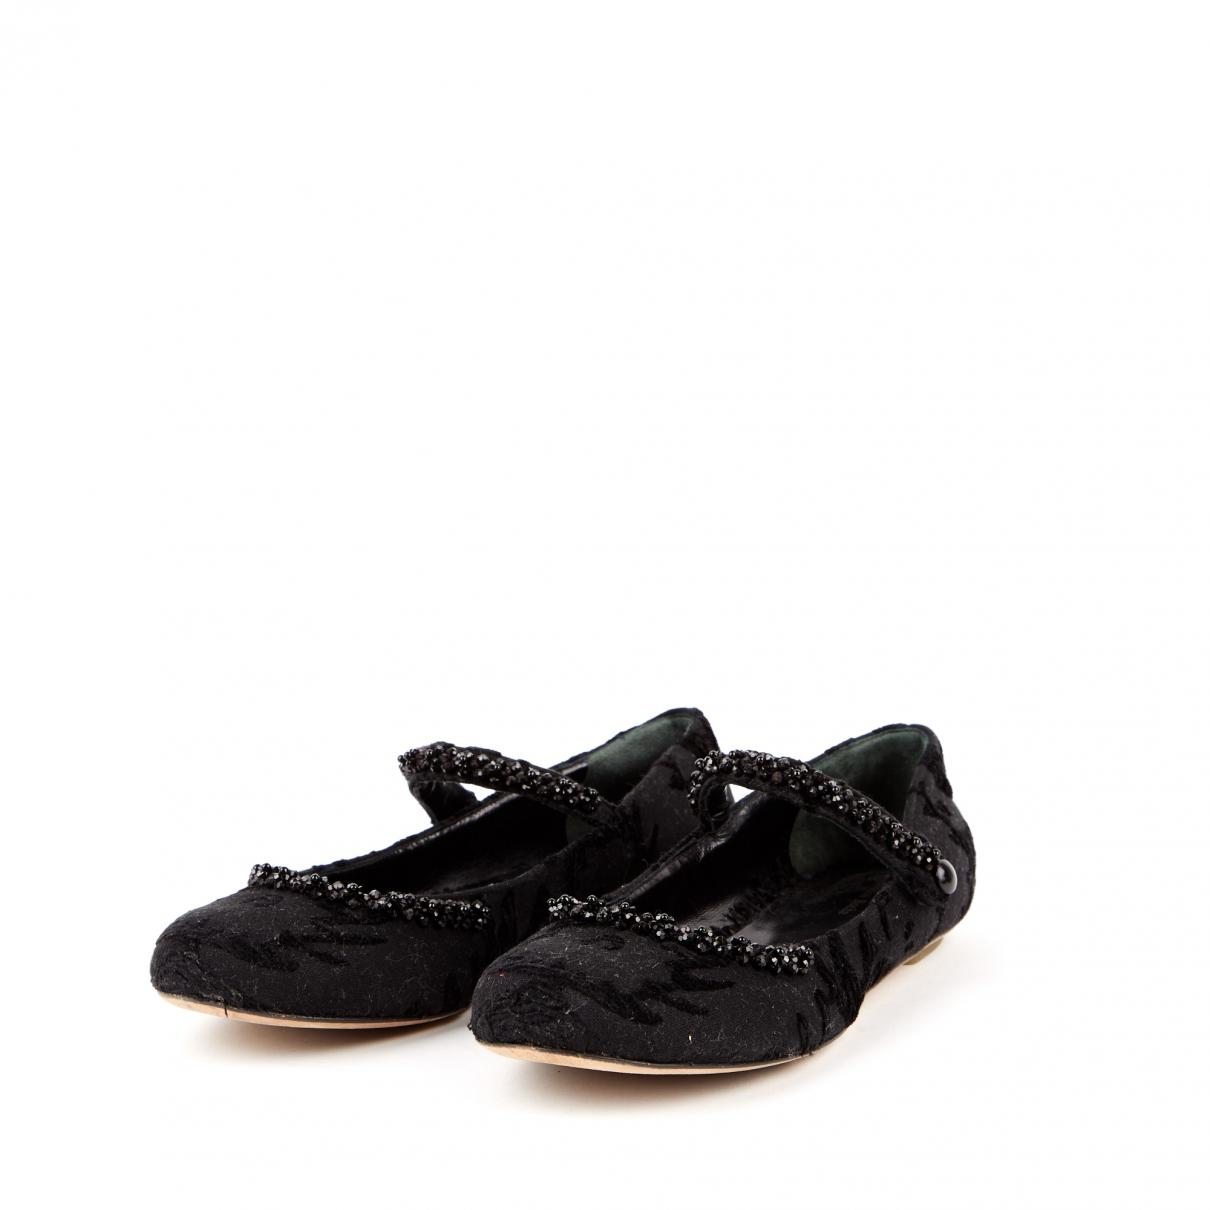 Mocasines de Lona Simone Rocha de color Negro